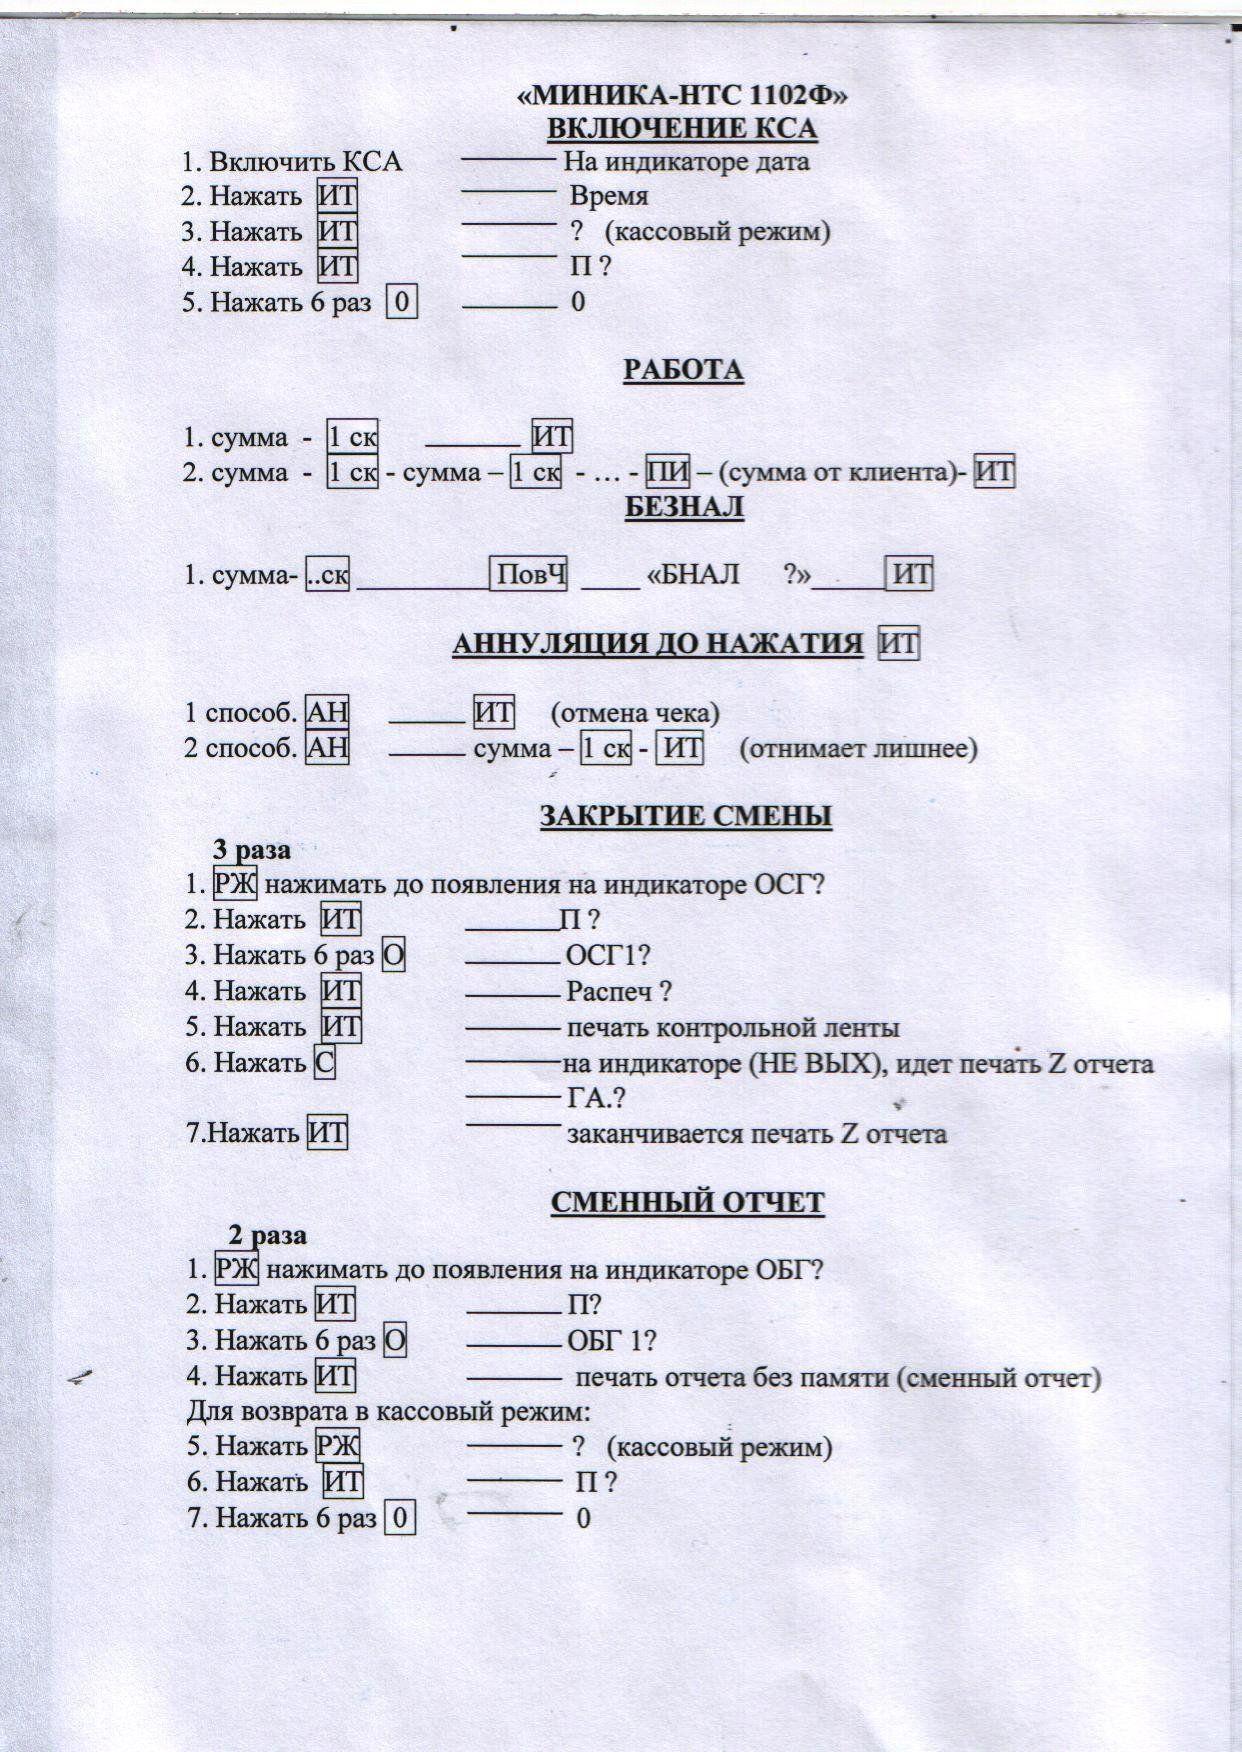 Инструкция по эксплуатации миника 1102ф